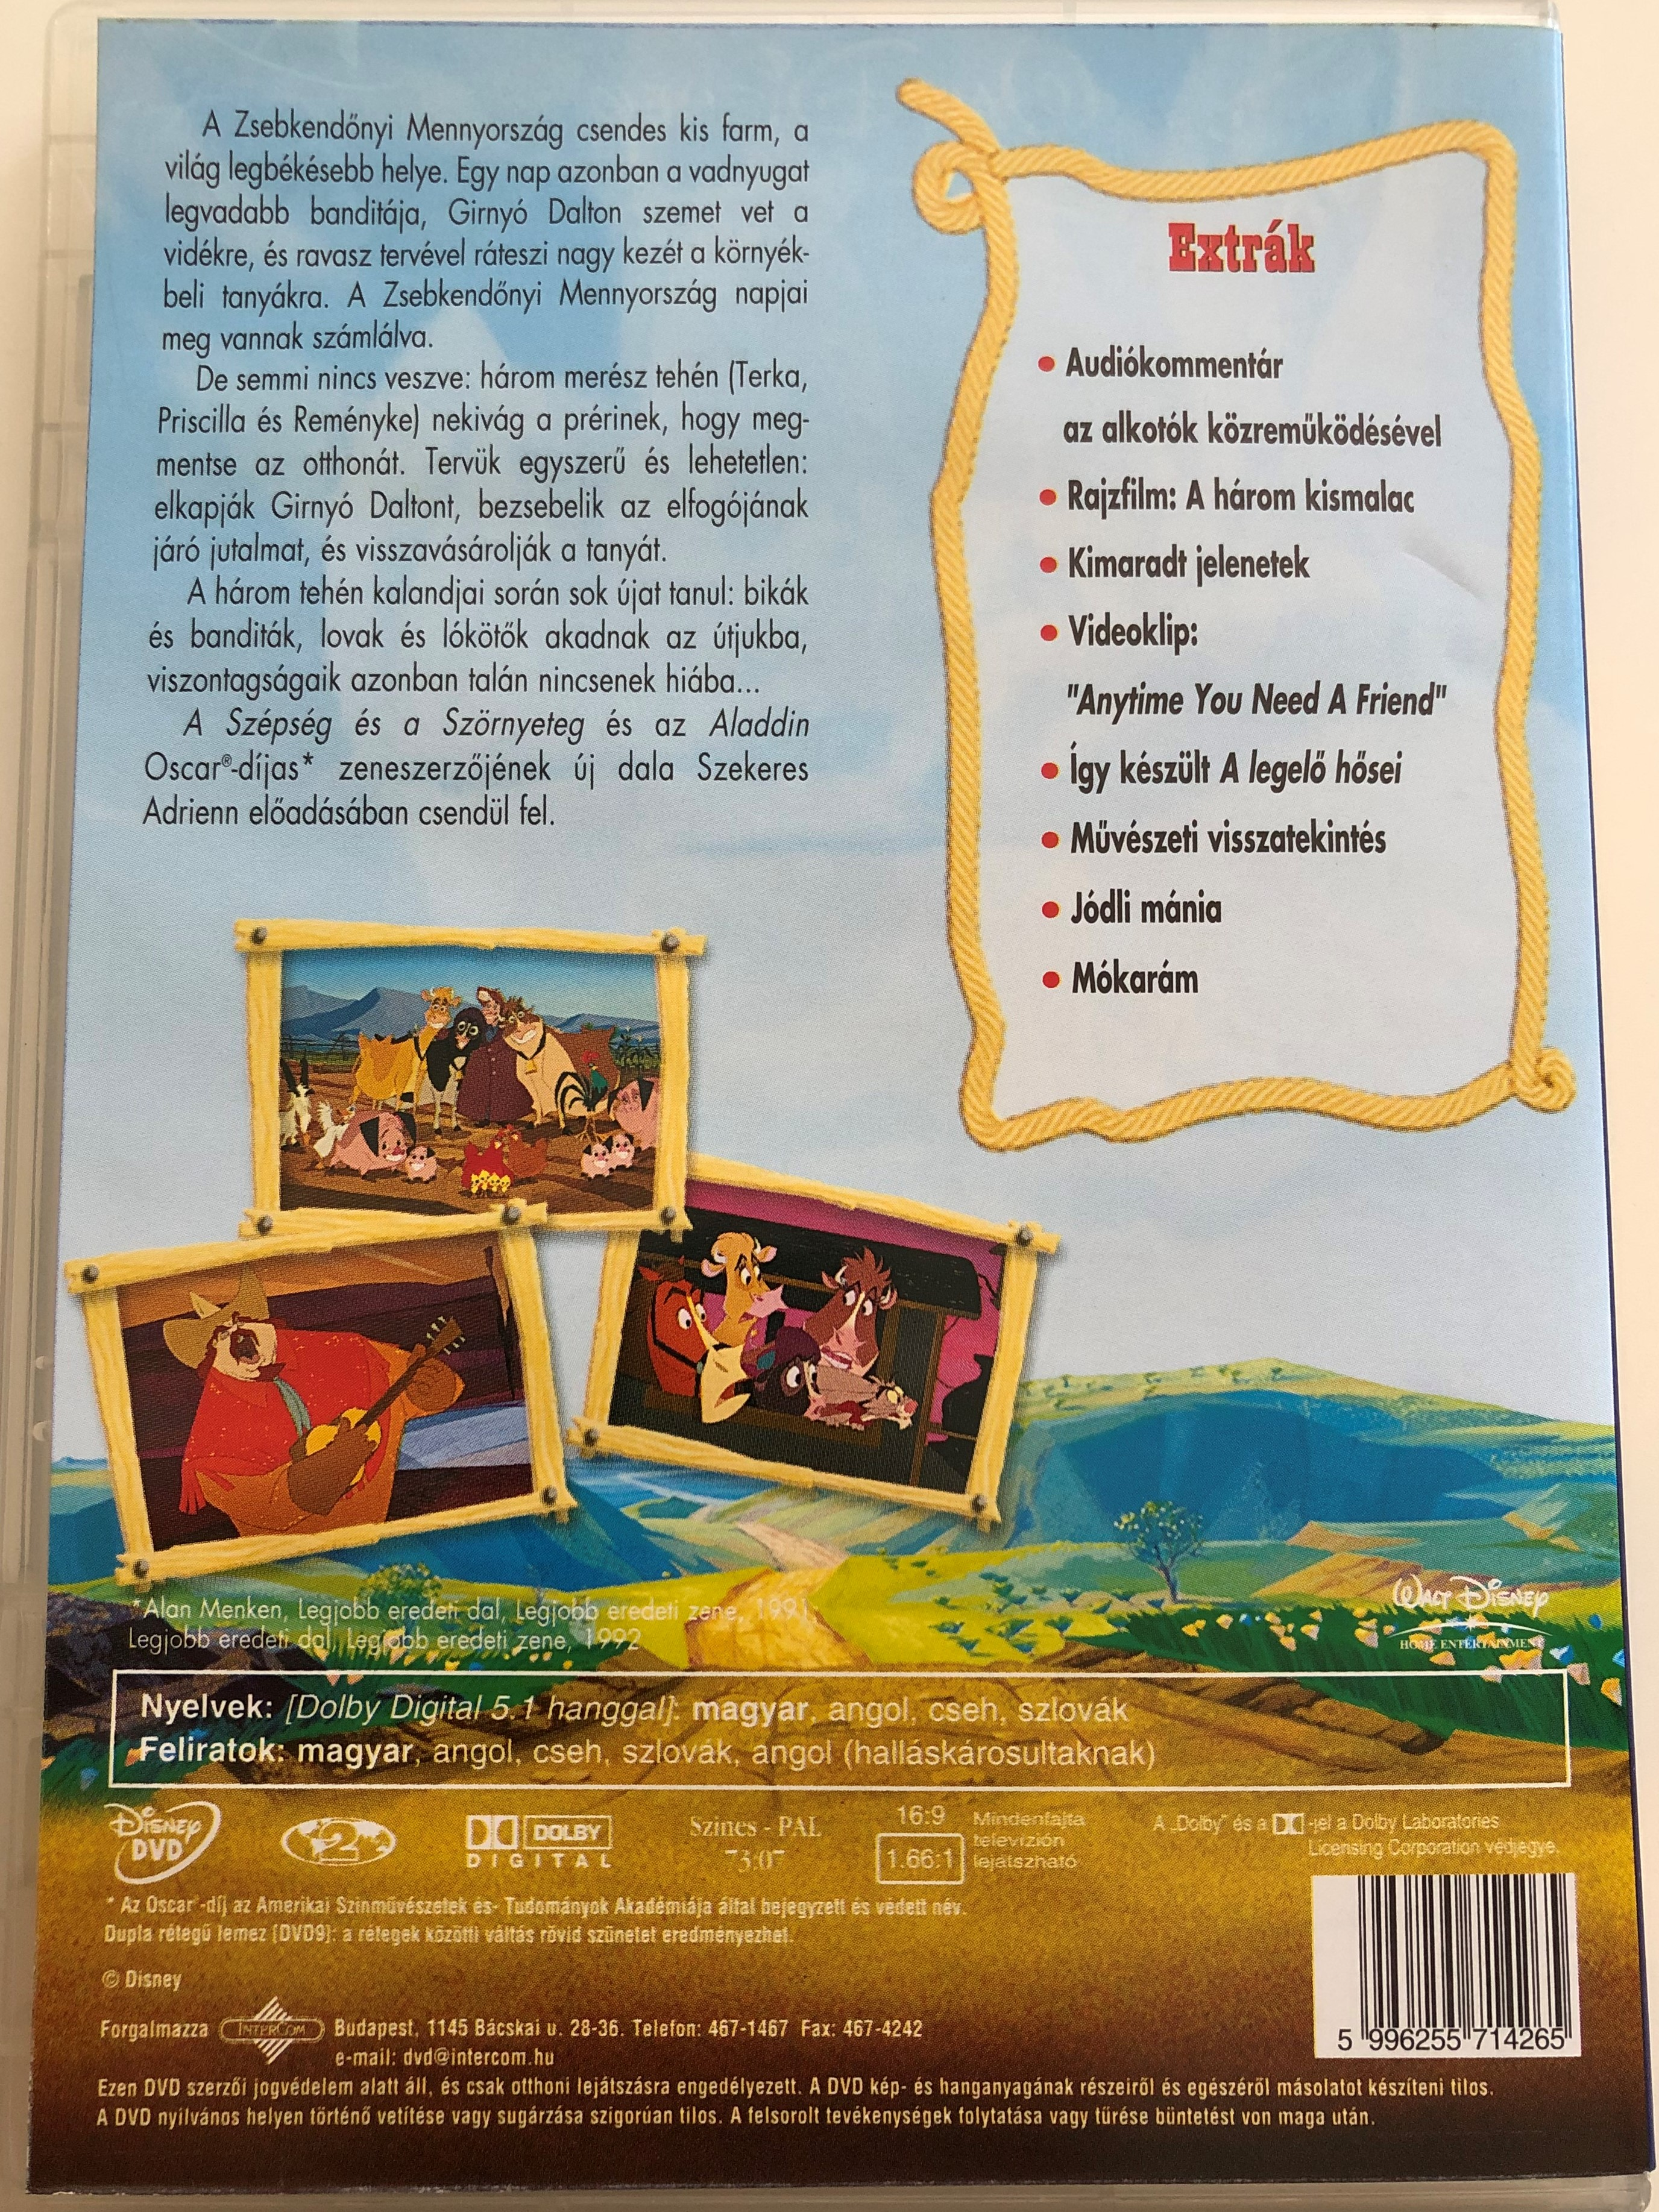 home-on-the-range-dvd-2004-a-legel-h-sei-directed-by-will-finn-john-sanford-starring-roseanne-barr-judi-dench-jennifer-tilly-cuba-gooding-jr.-randy-quaid-steve-buscemi-2-.jpg